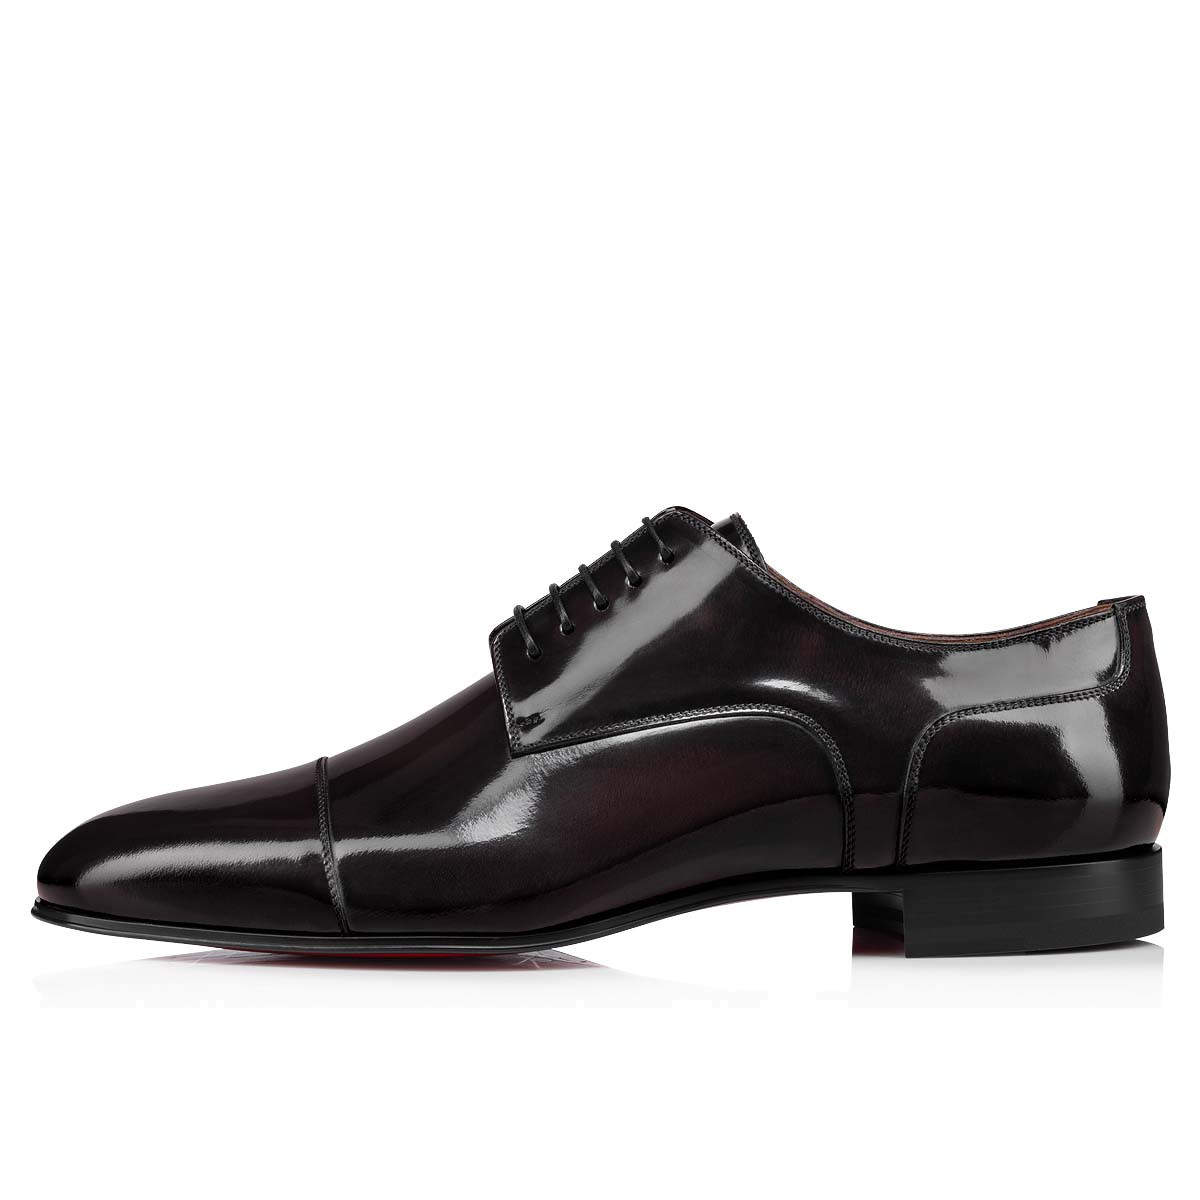 鞋履 - Surcity Flat - Christian Louboutin